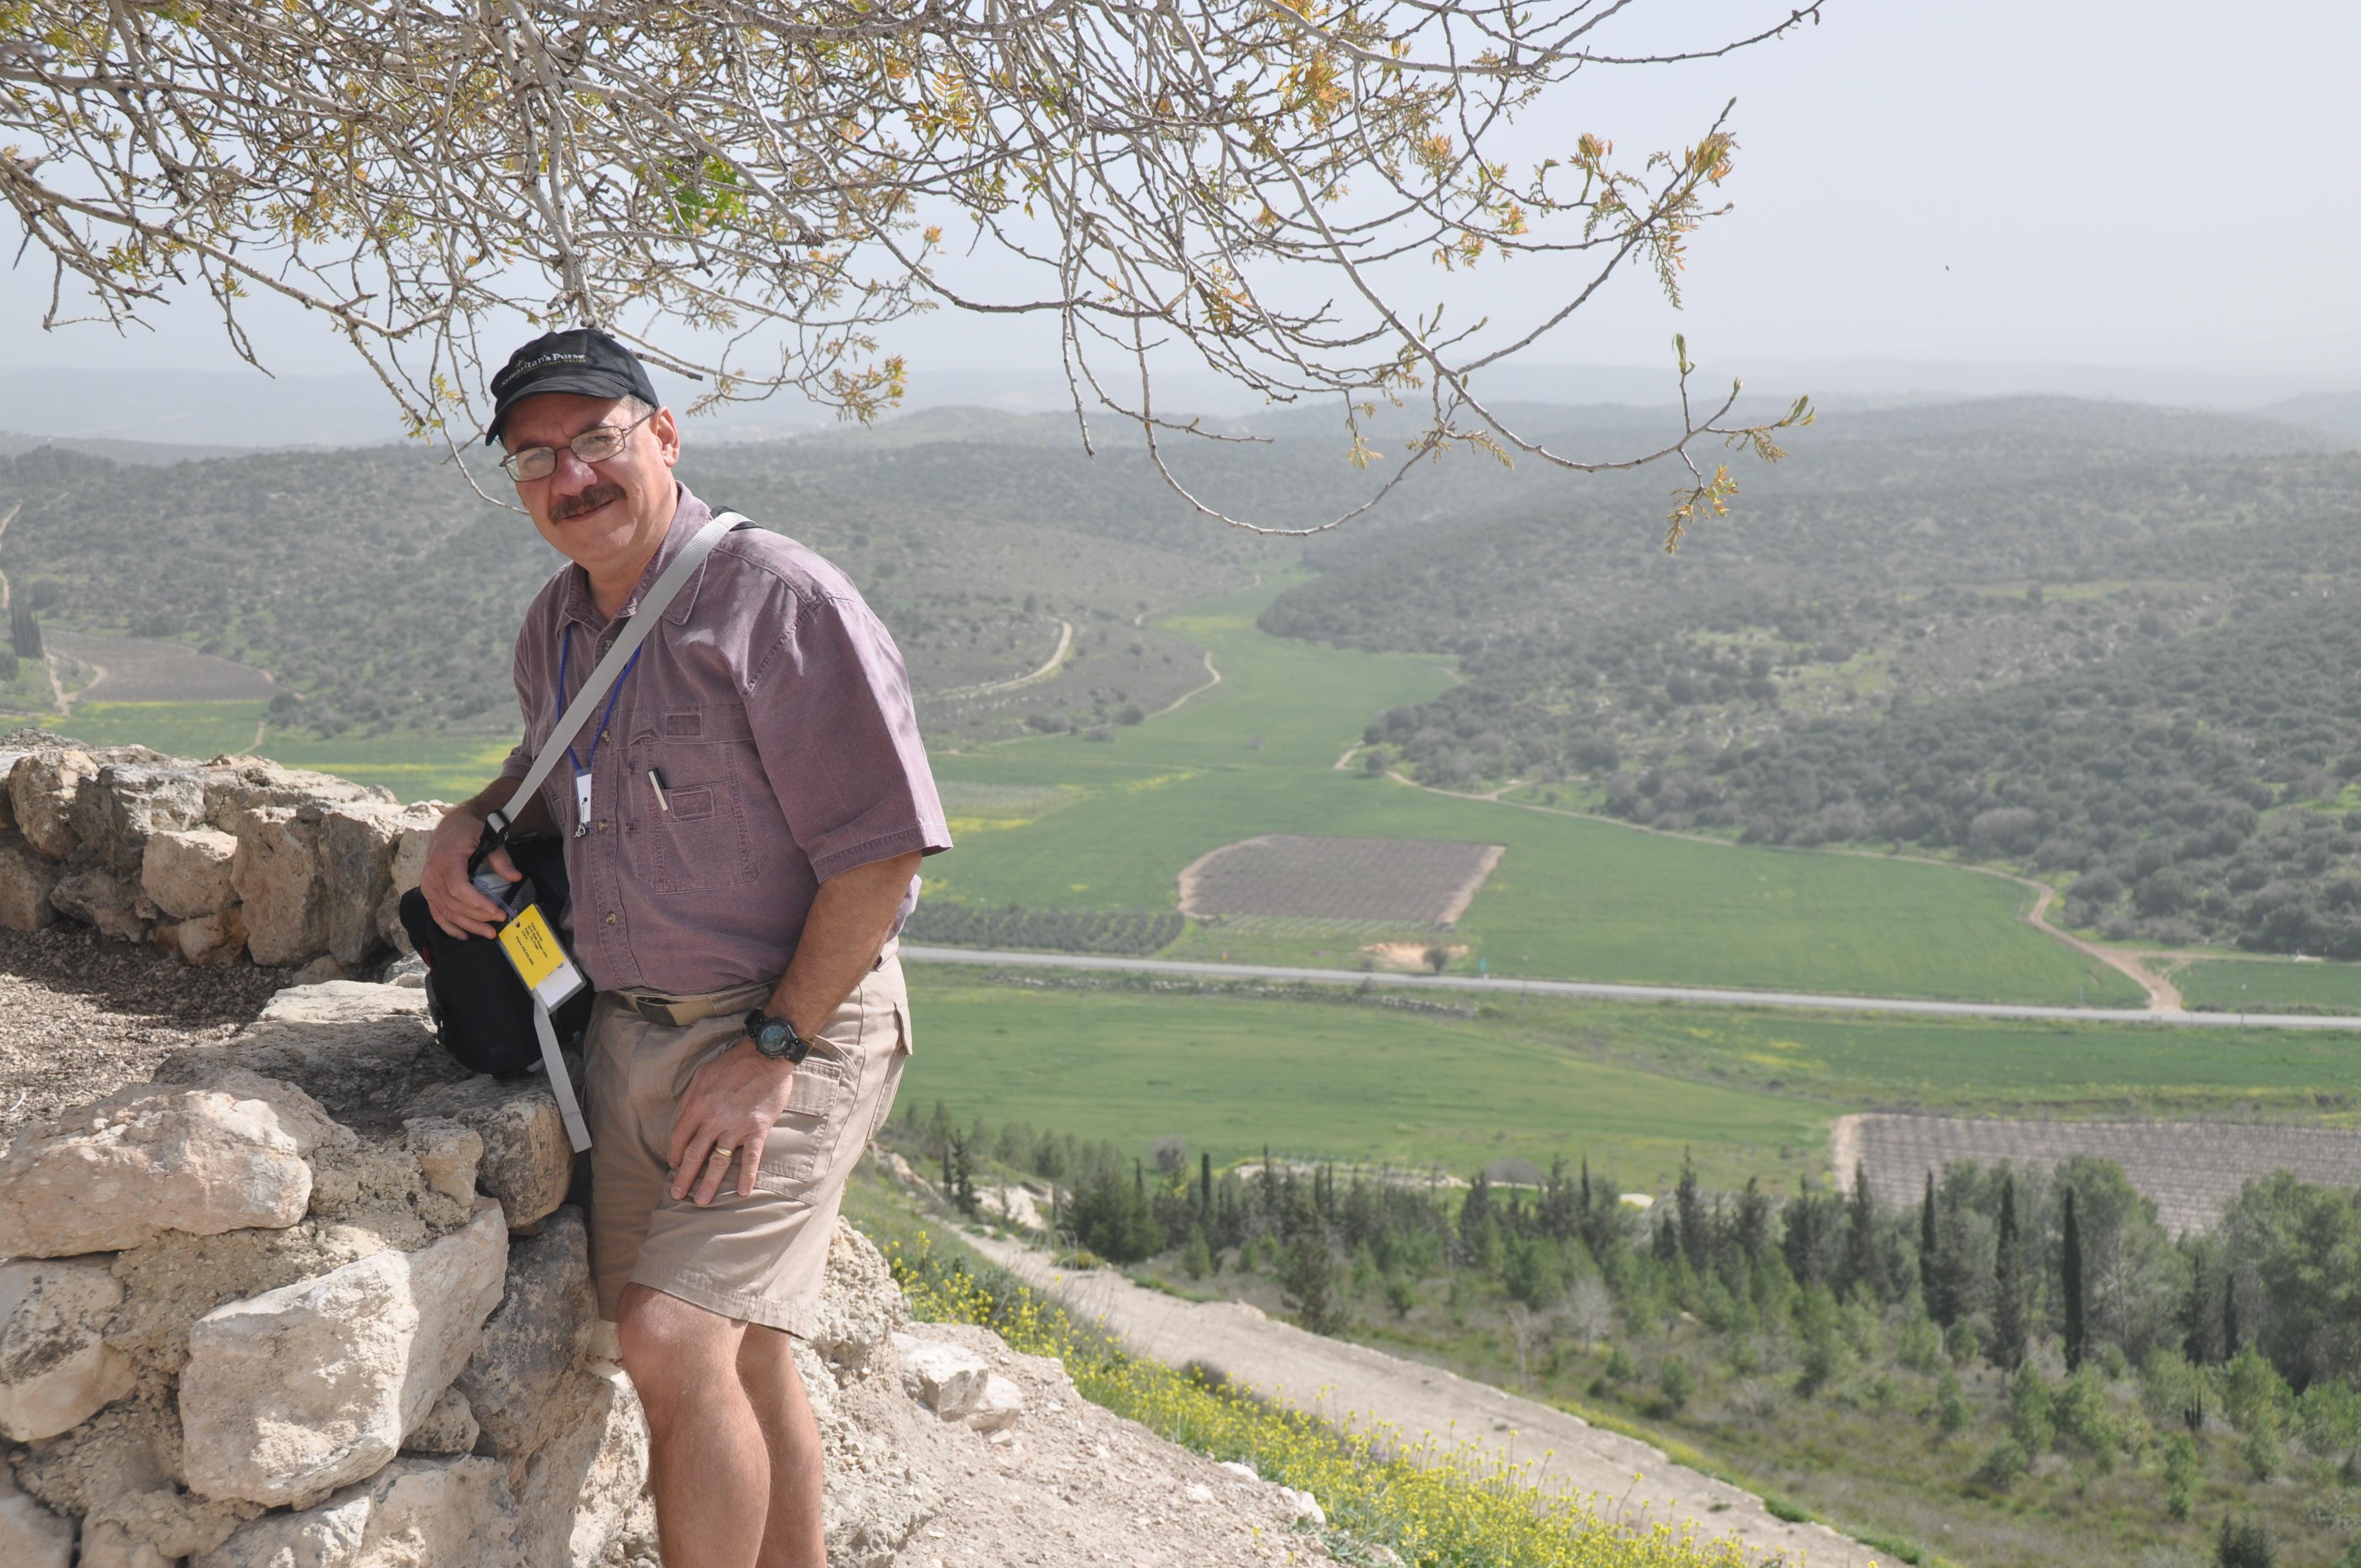 Overlooking the Valley of Elah